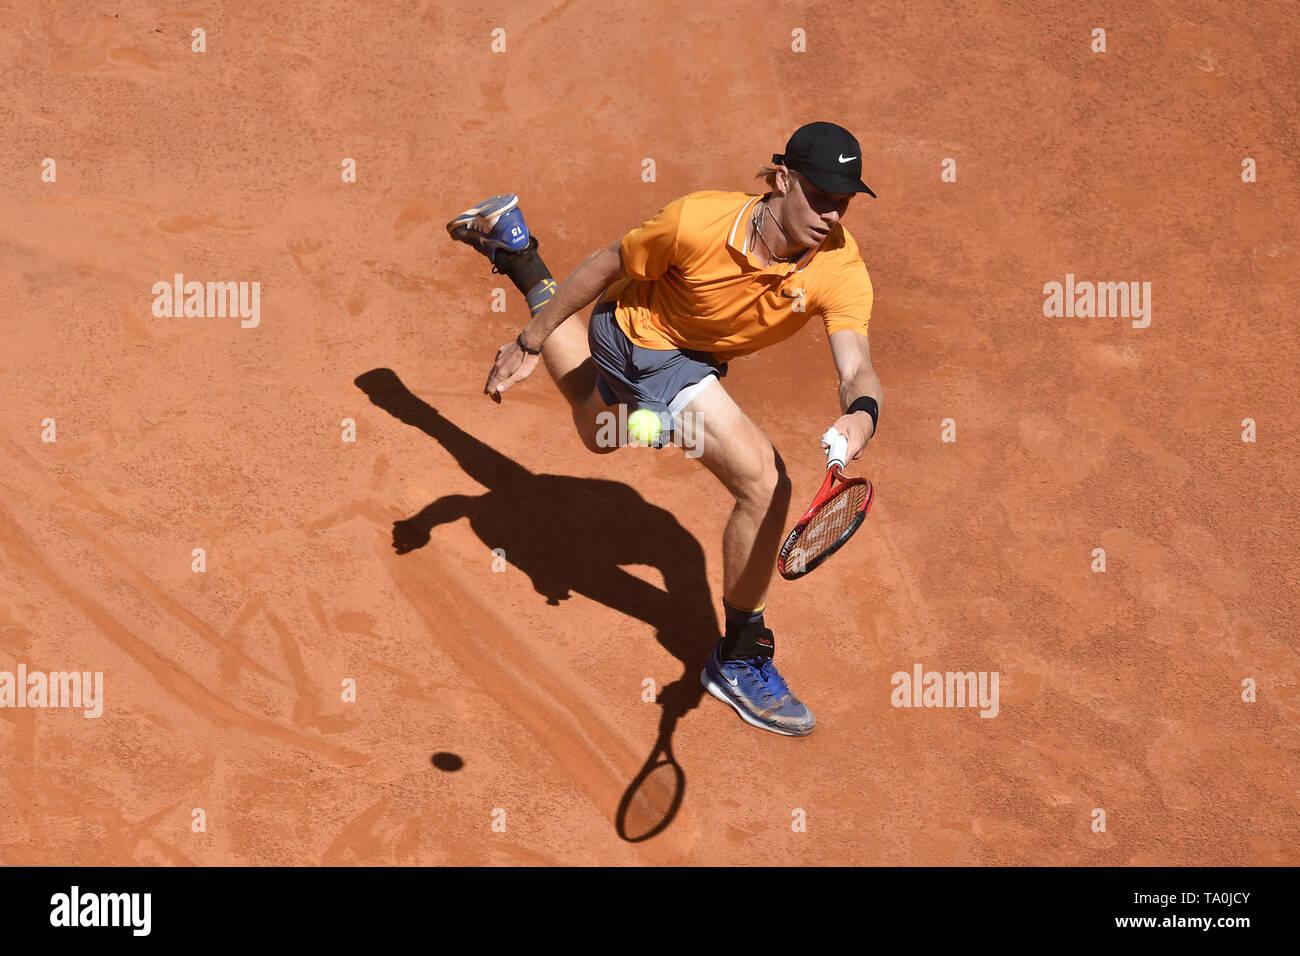 Denis Shapovalov of Canada  in action during the match against Novak Djokovic of Serbia. Roma 16-05-2018 Foro Italico   Internazionali BNL D'Italia It - Stock Image